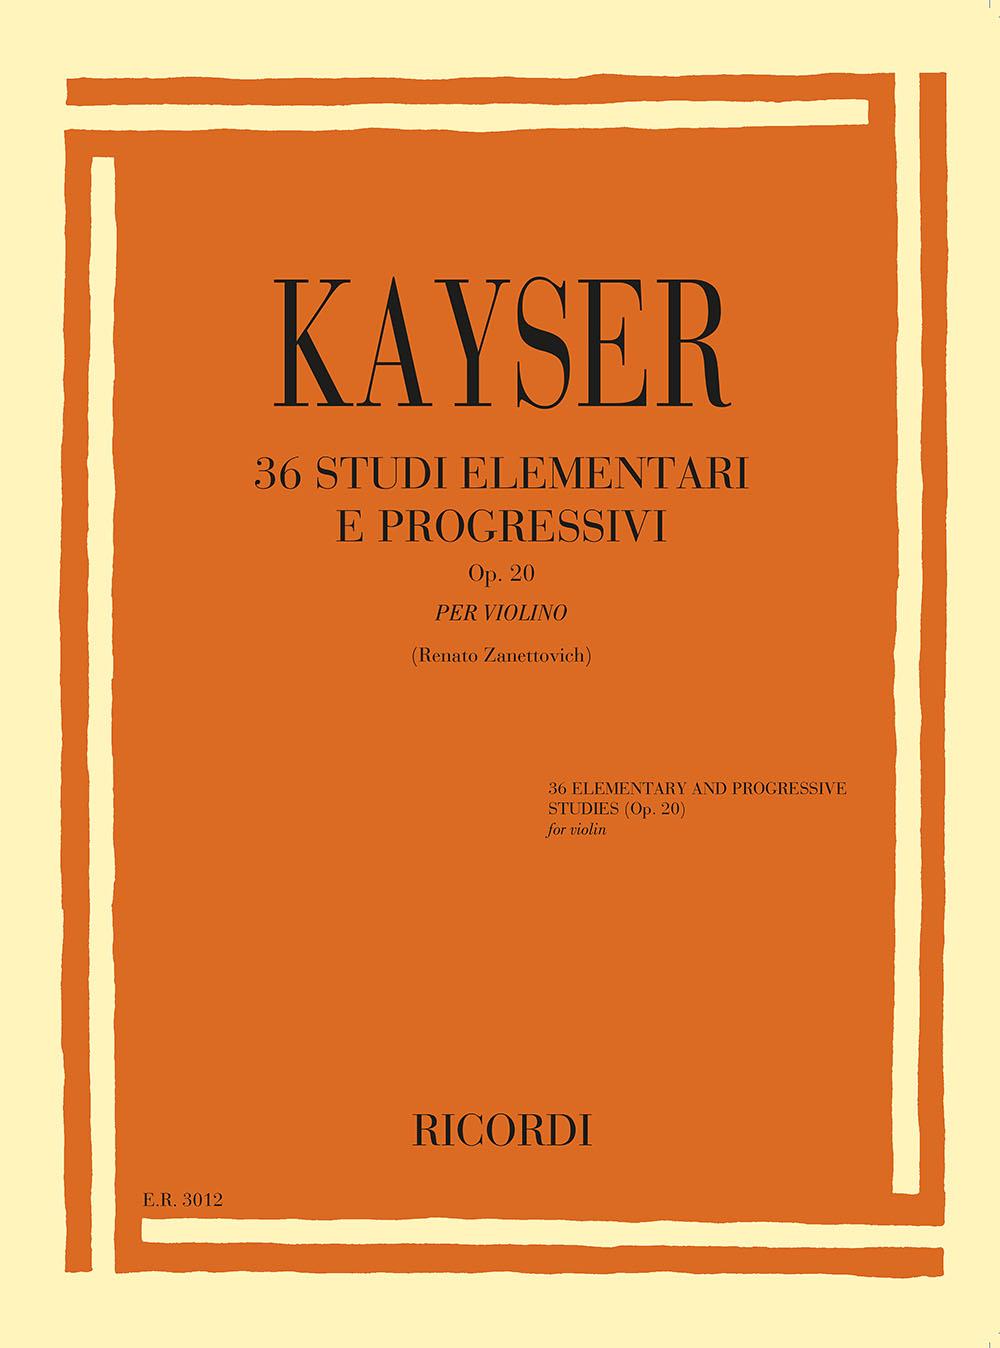 Heinrich Ernst Kayser: 36 Studi elementari e progressivi Op.20: Violin